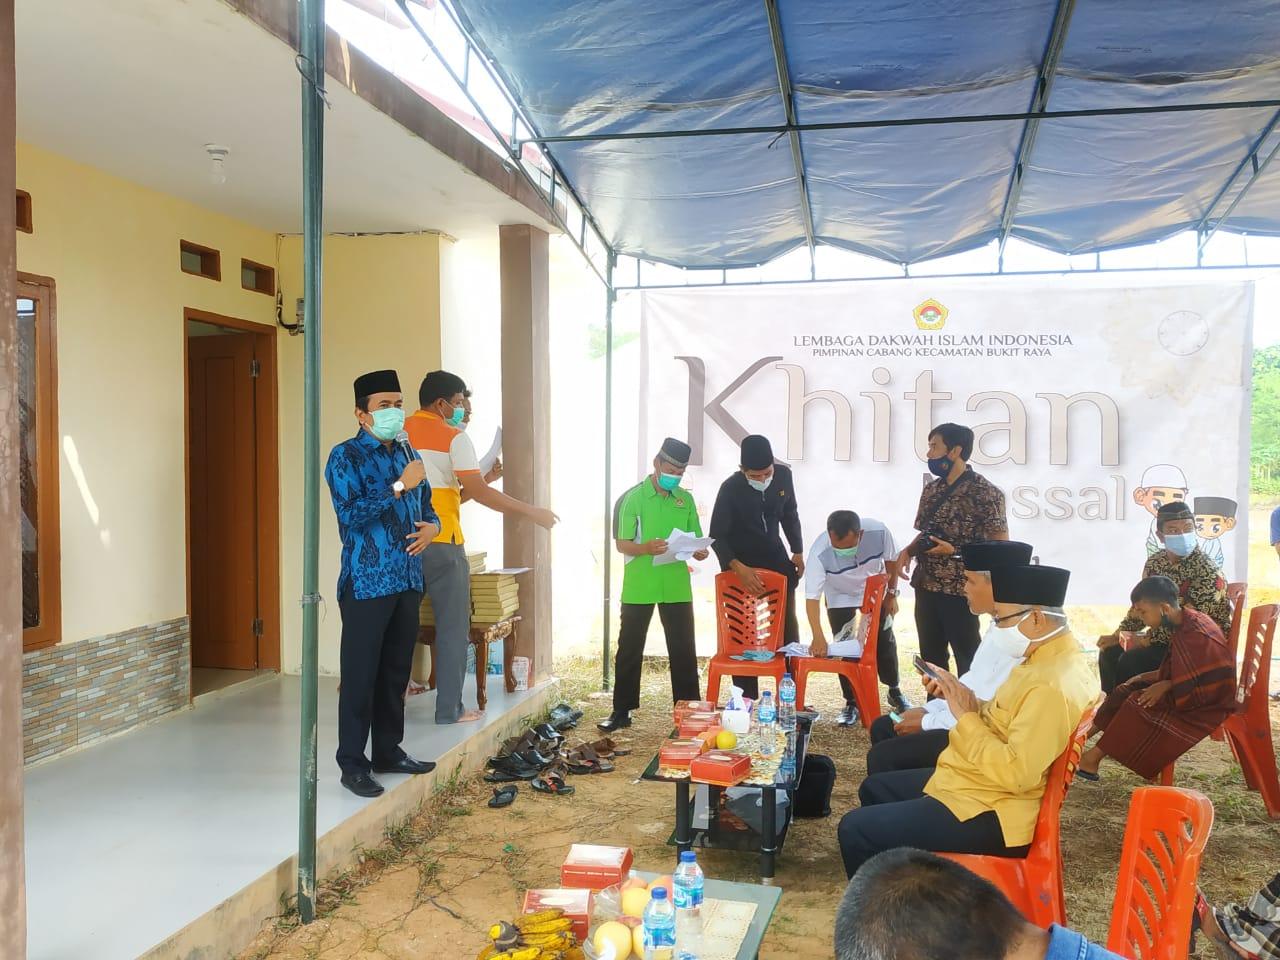 Camat Bukitraya Buka Khitanan Massal PC Lembaga Dakwah Indonesia